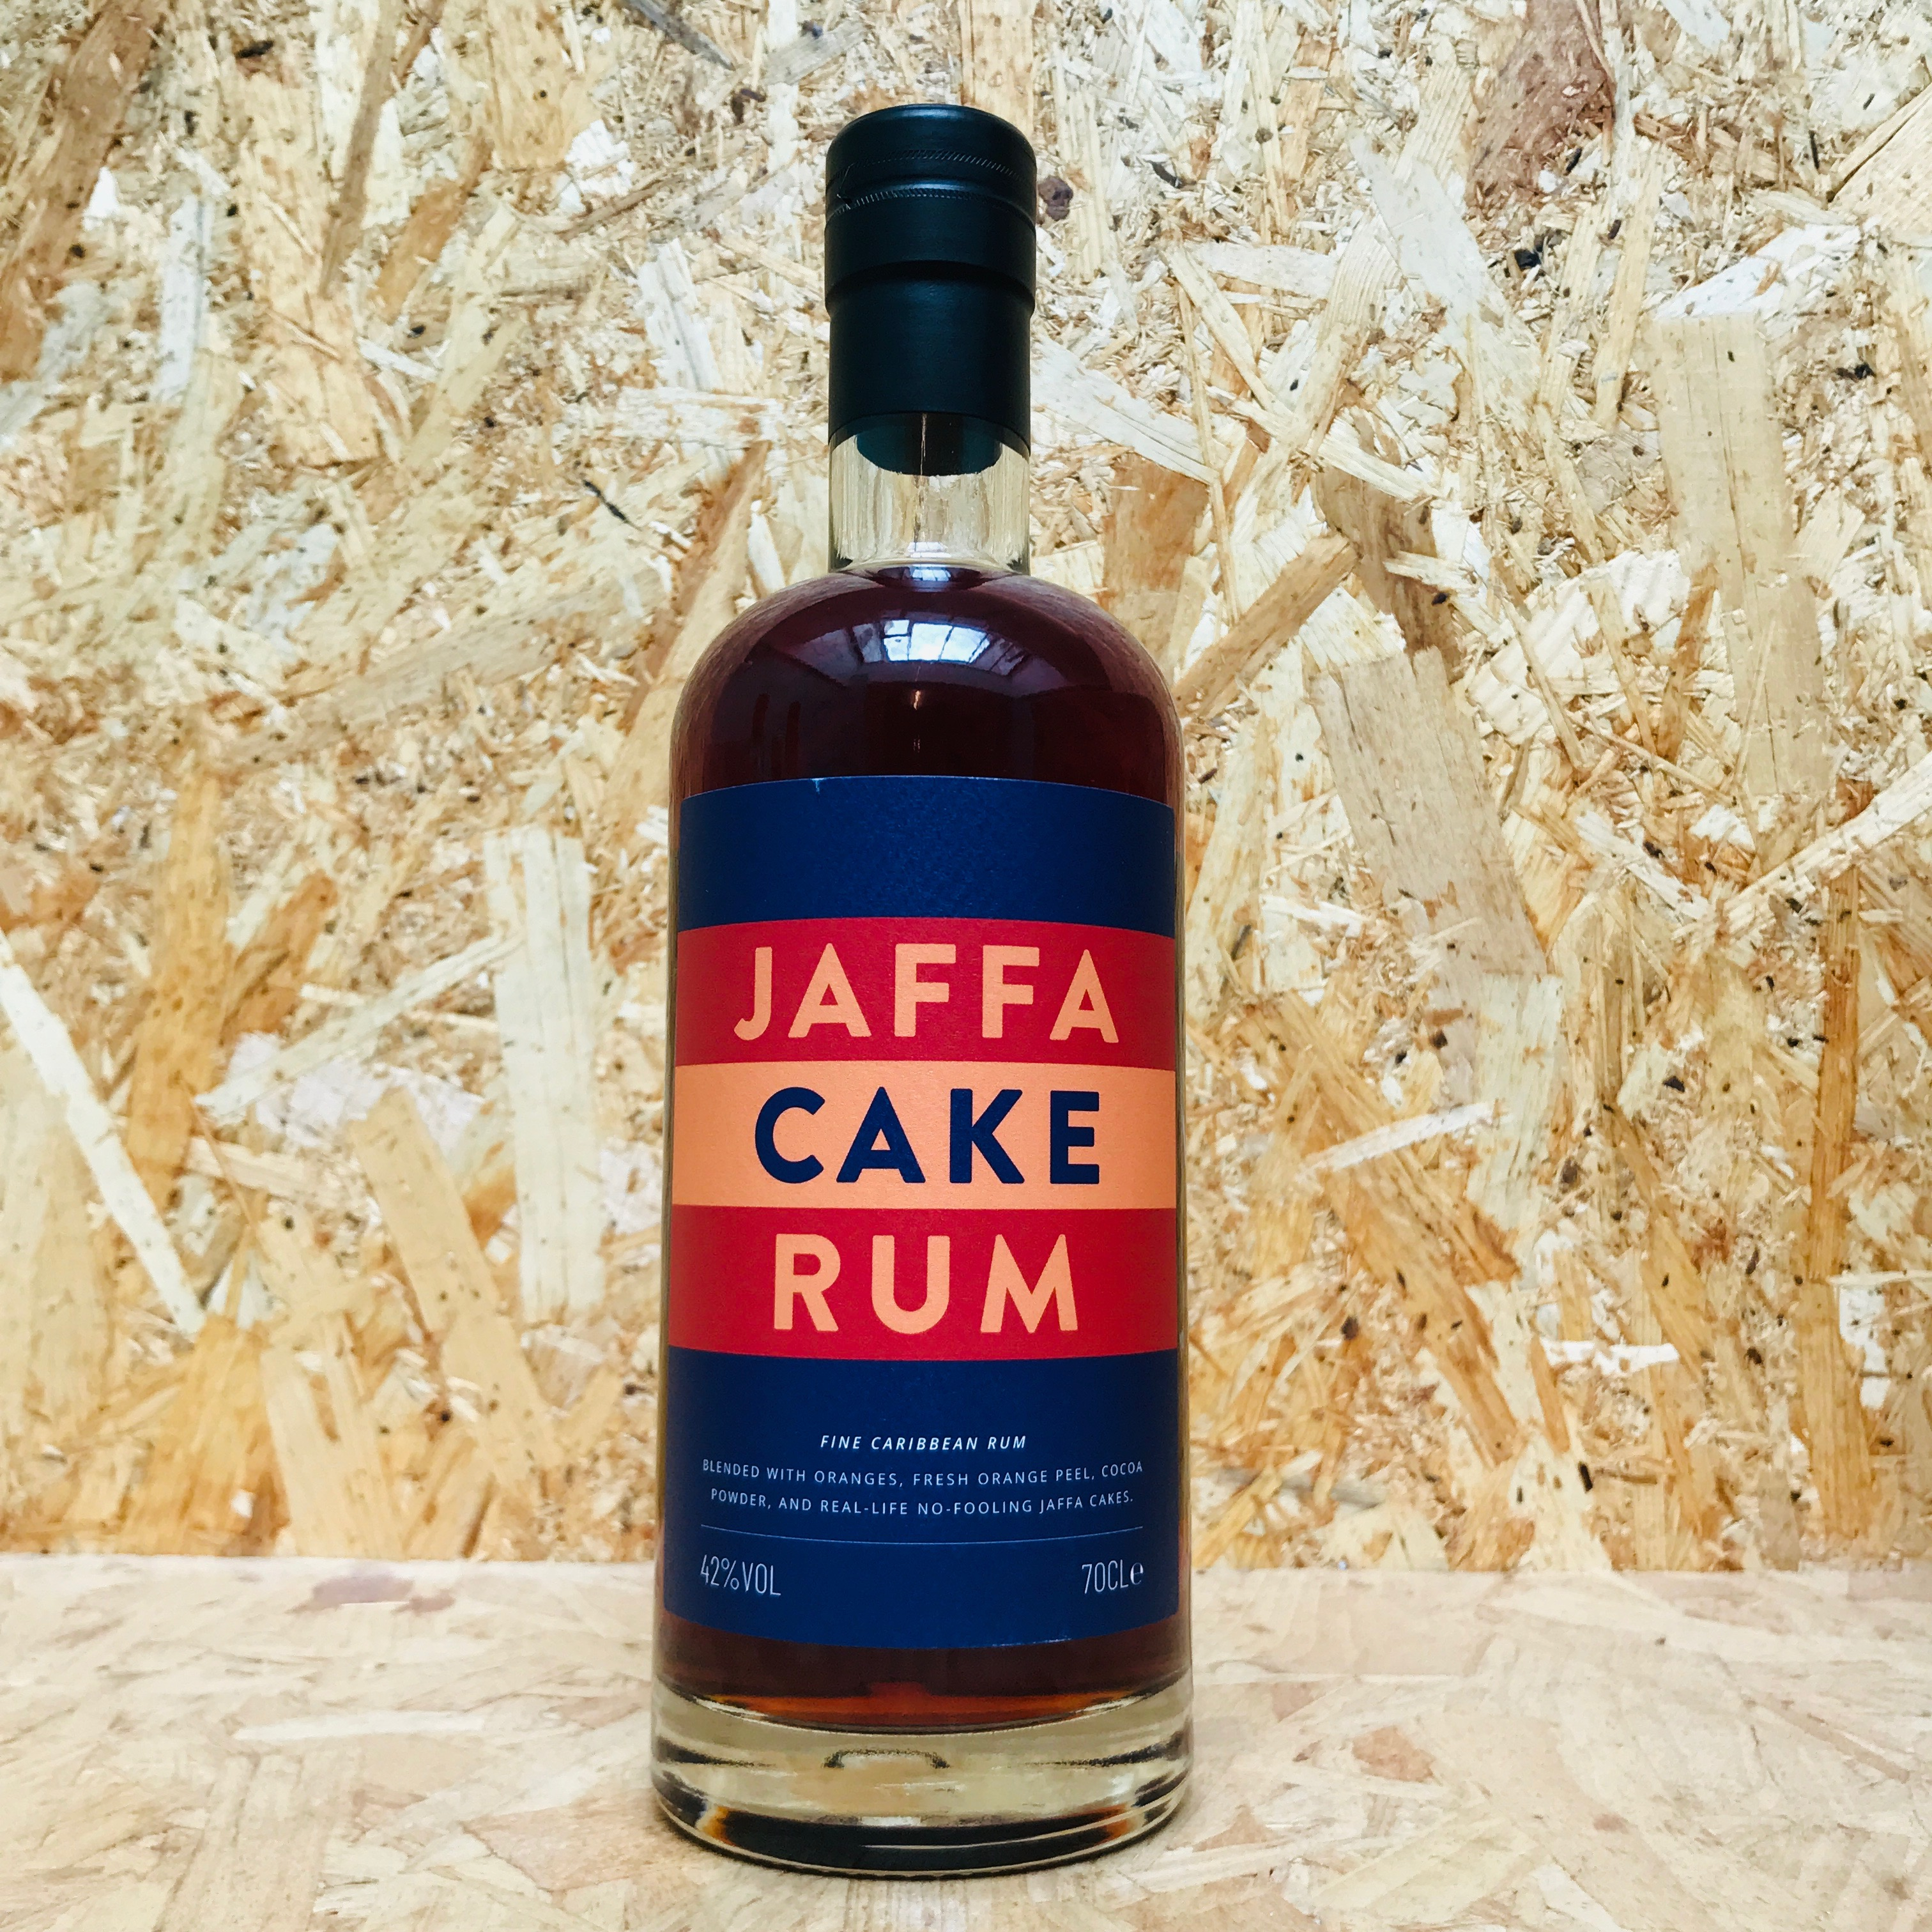 Jaffa Cake Rum